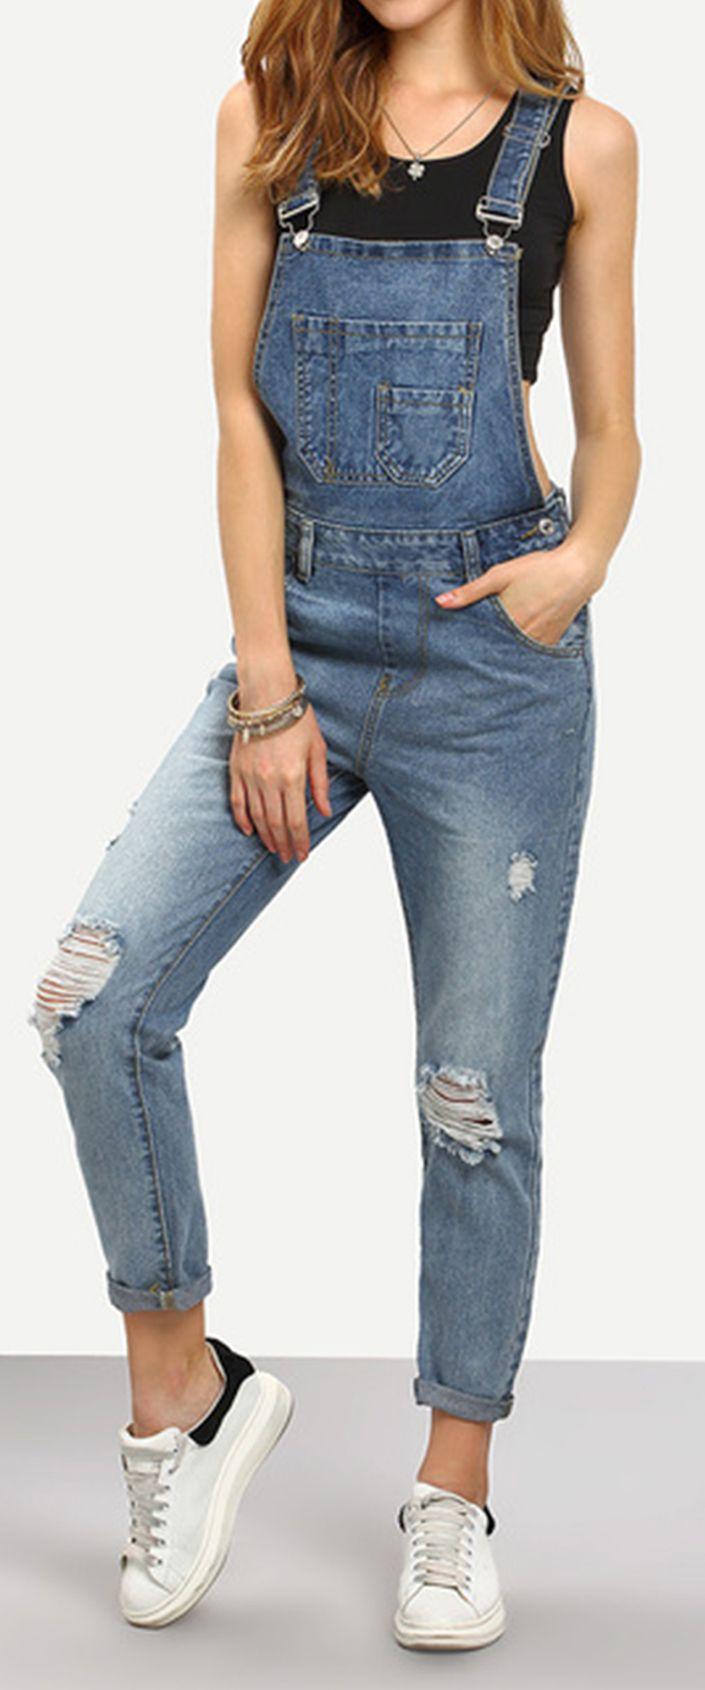 da2a3811a43 Ripped Stone Wash Denim Overall Jeans